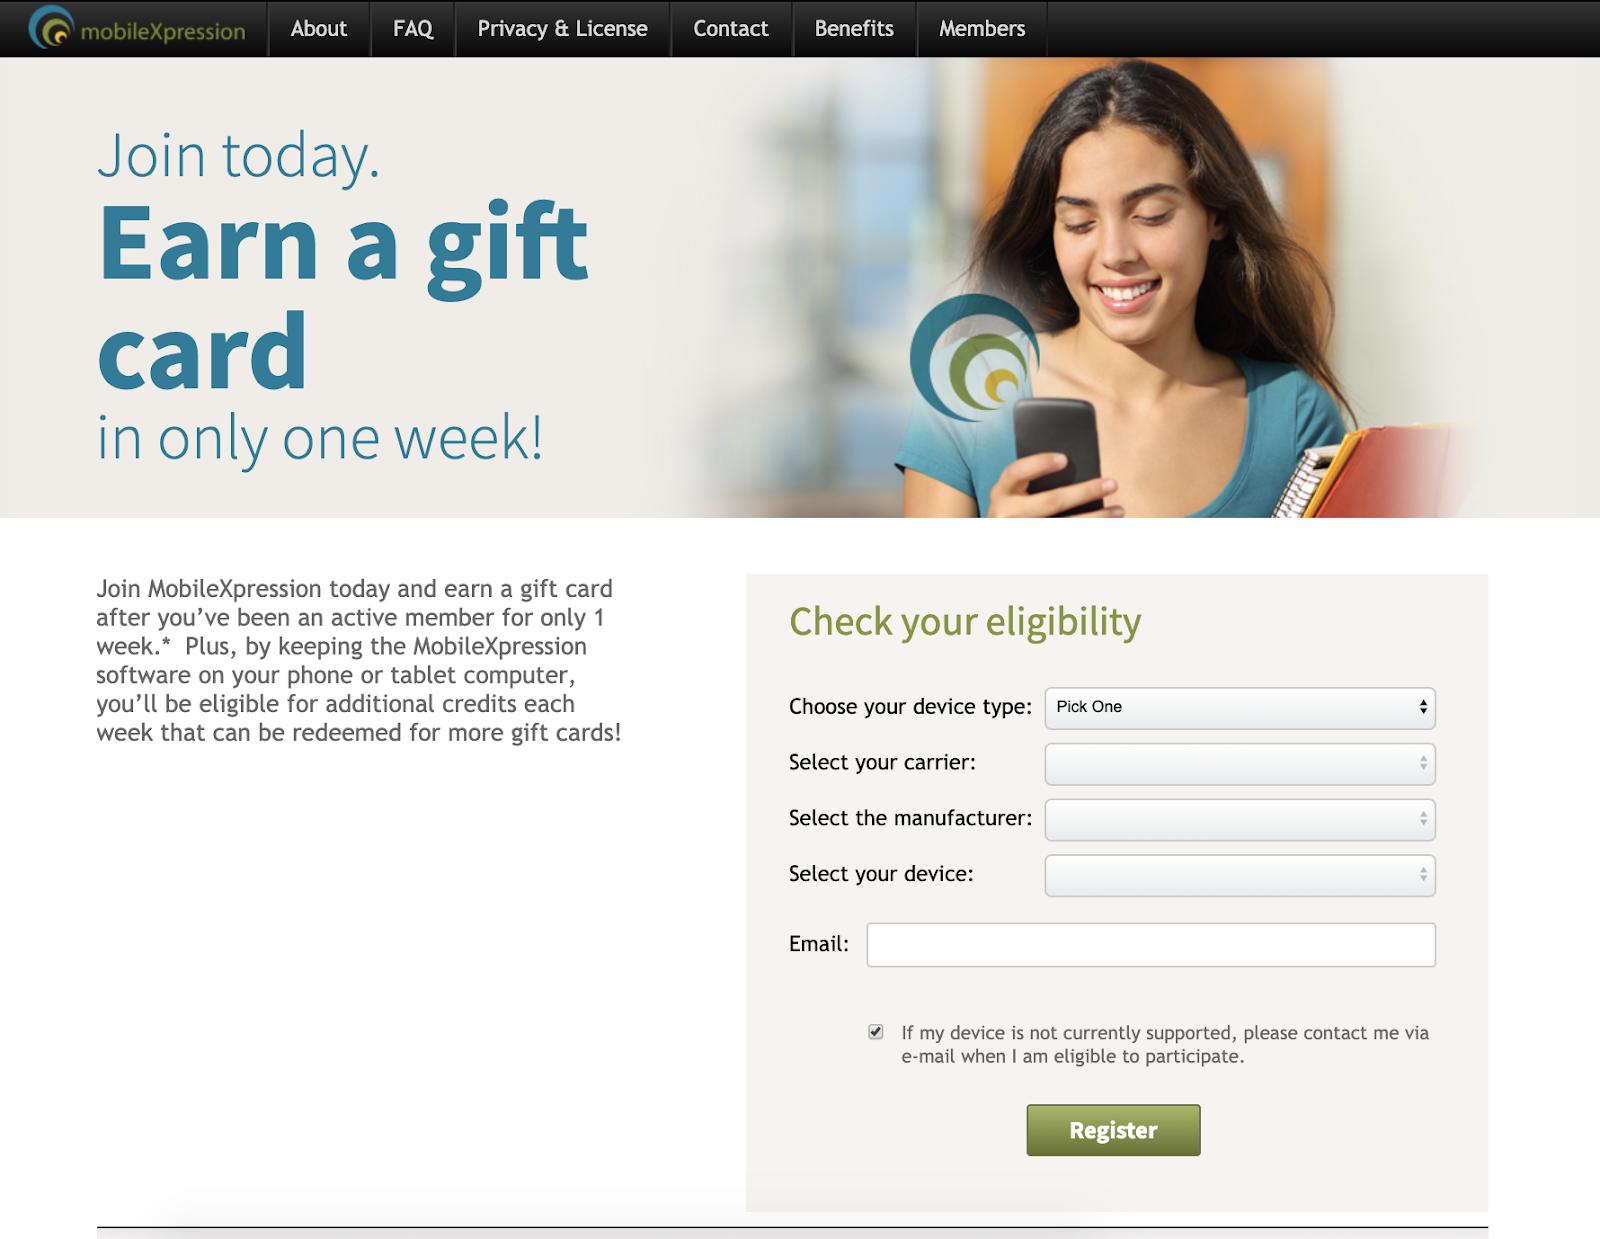 Captura de pantalla de la página de canje de tarjetas de regalo en MobileXpression